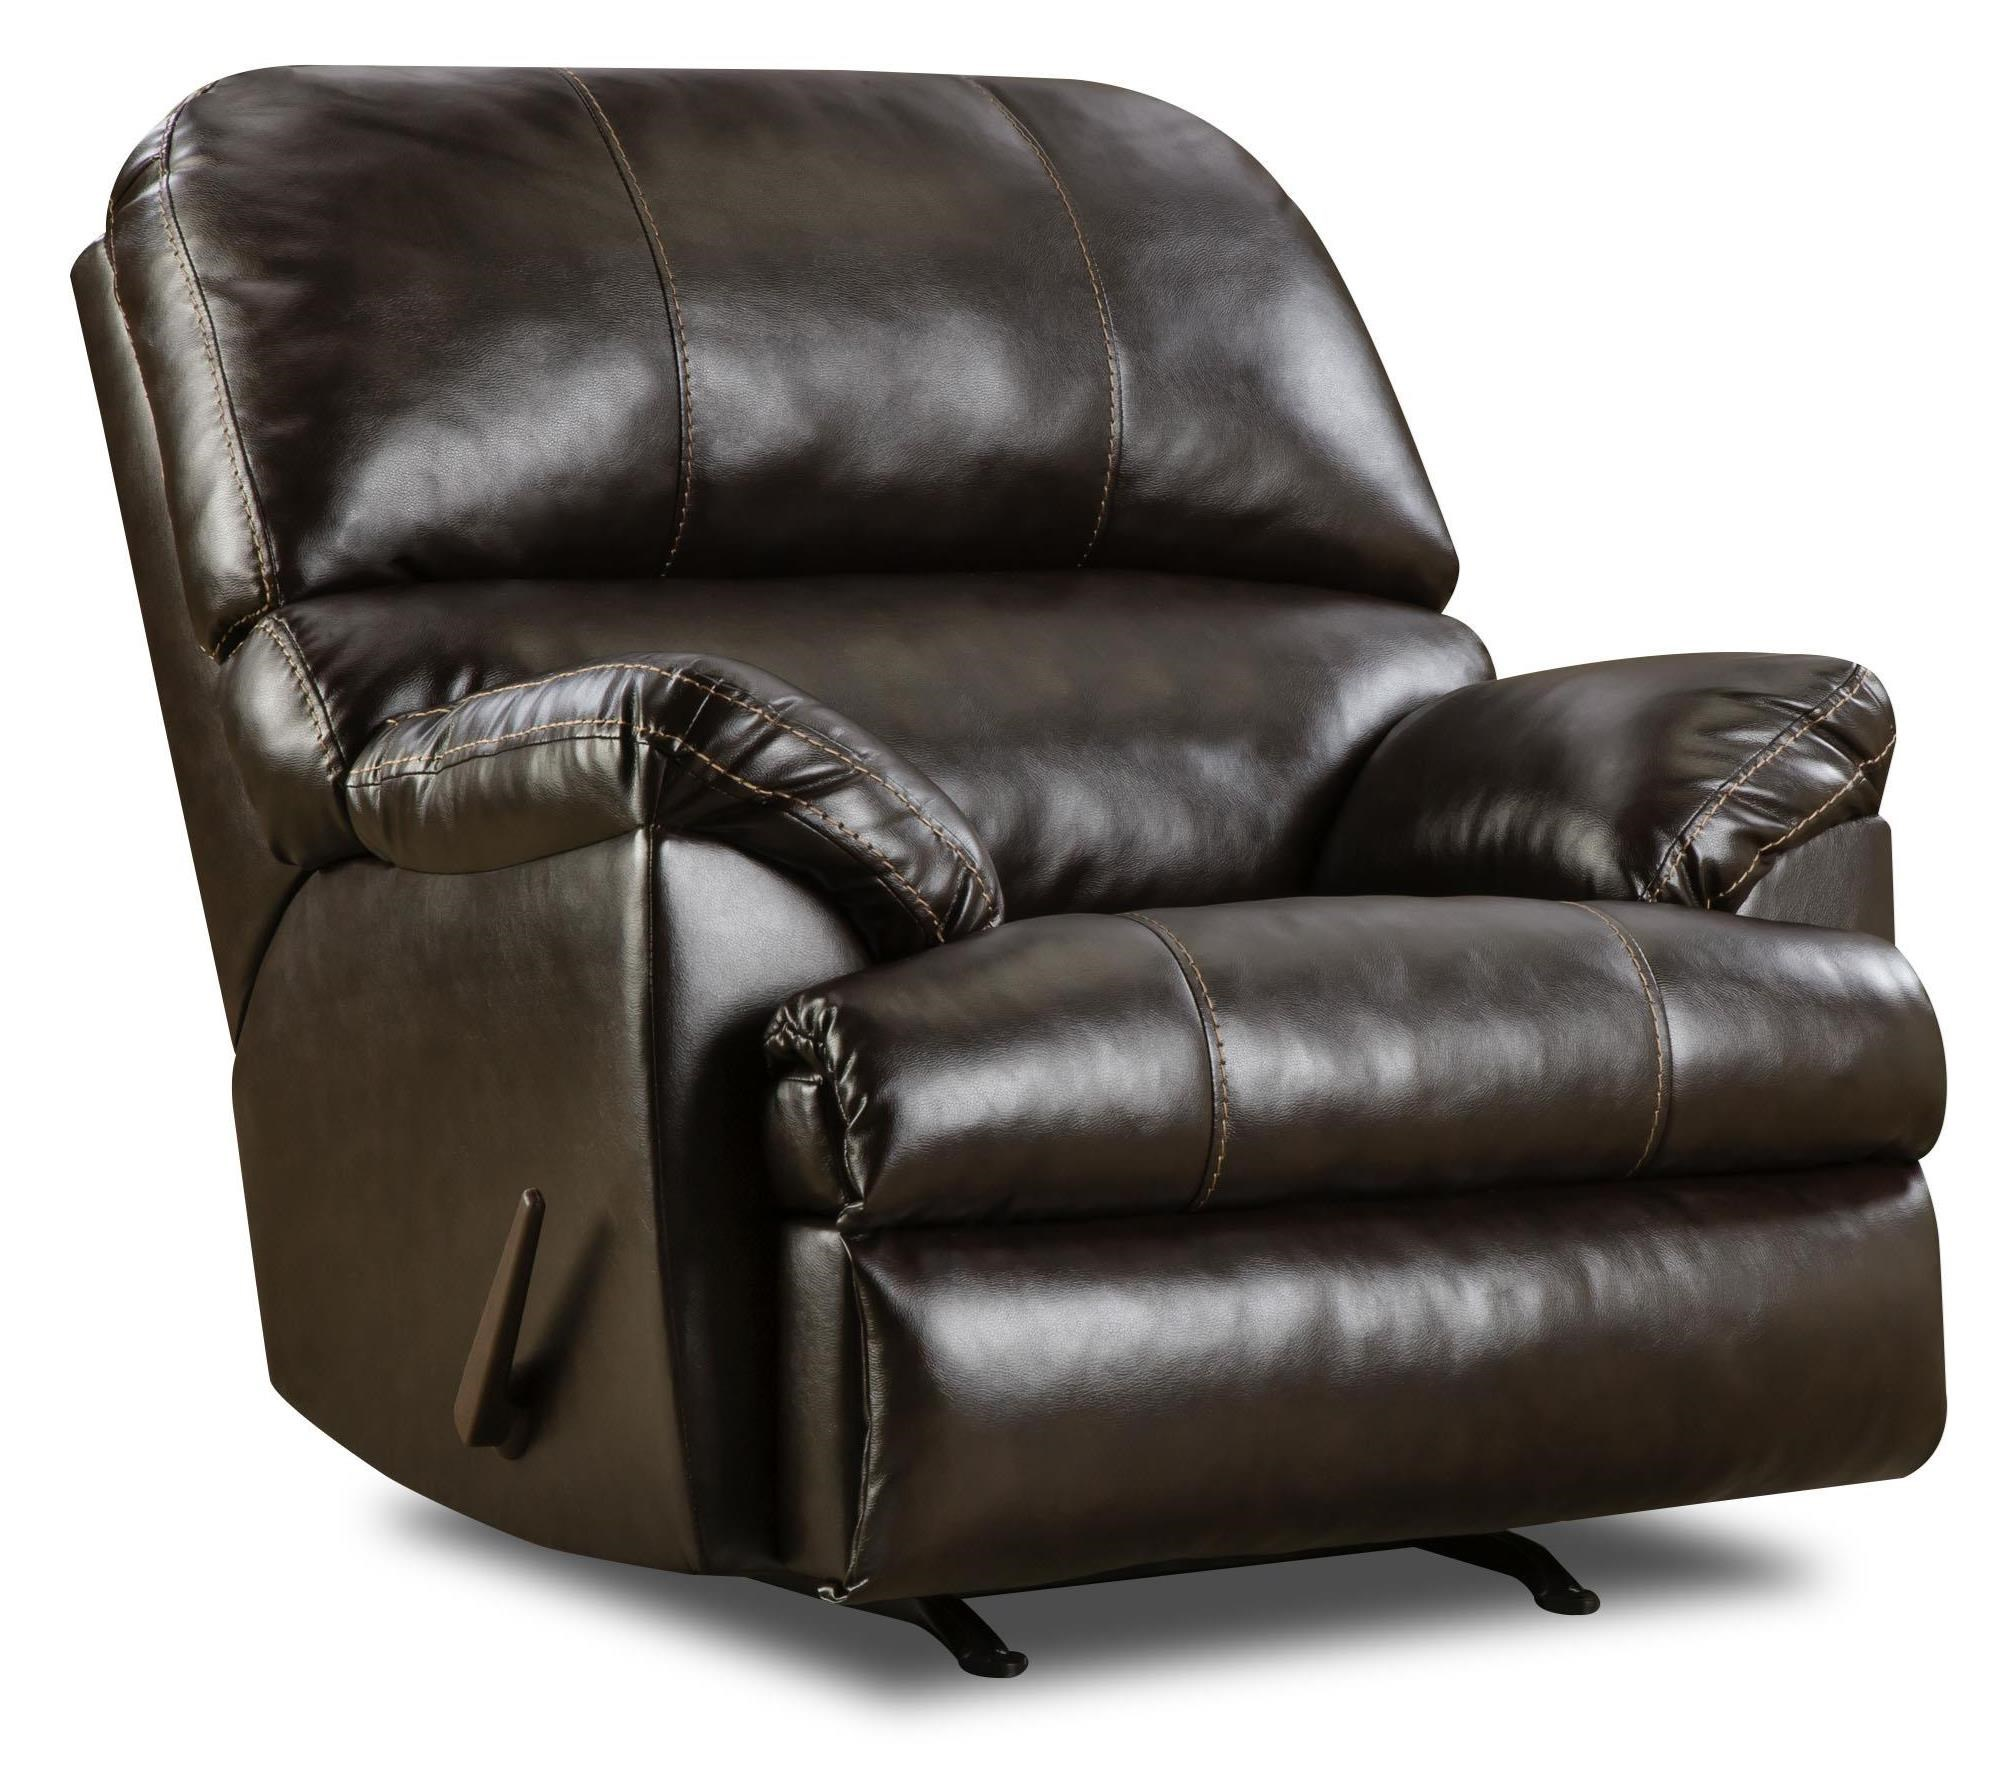 United Furniture Industries 8049 Rocker Recliner - Item Number: 8049 Bing Brown Rocker Recliner